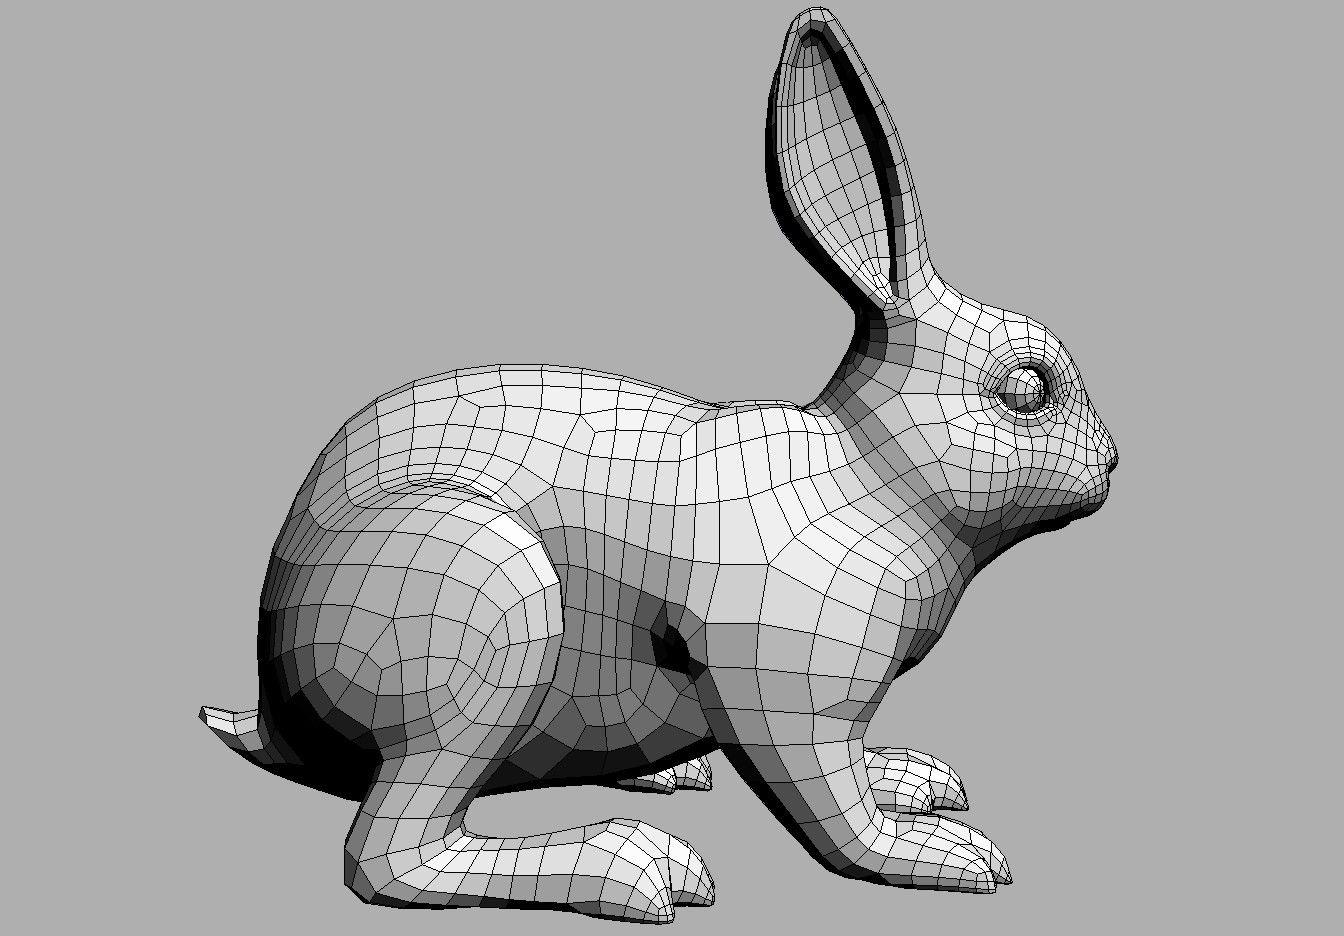 3d Model Rabbit 3d Model Character Rabbit Anatomy Animal Drawings